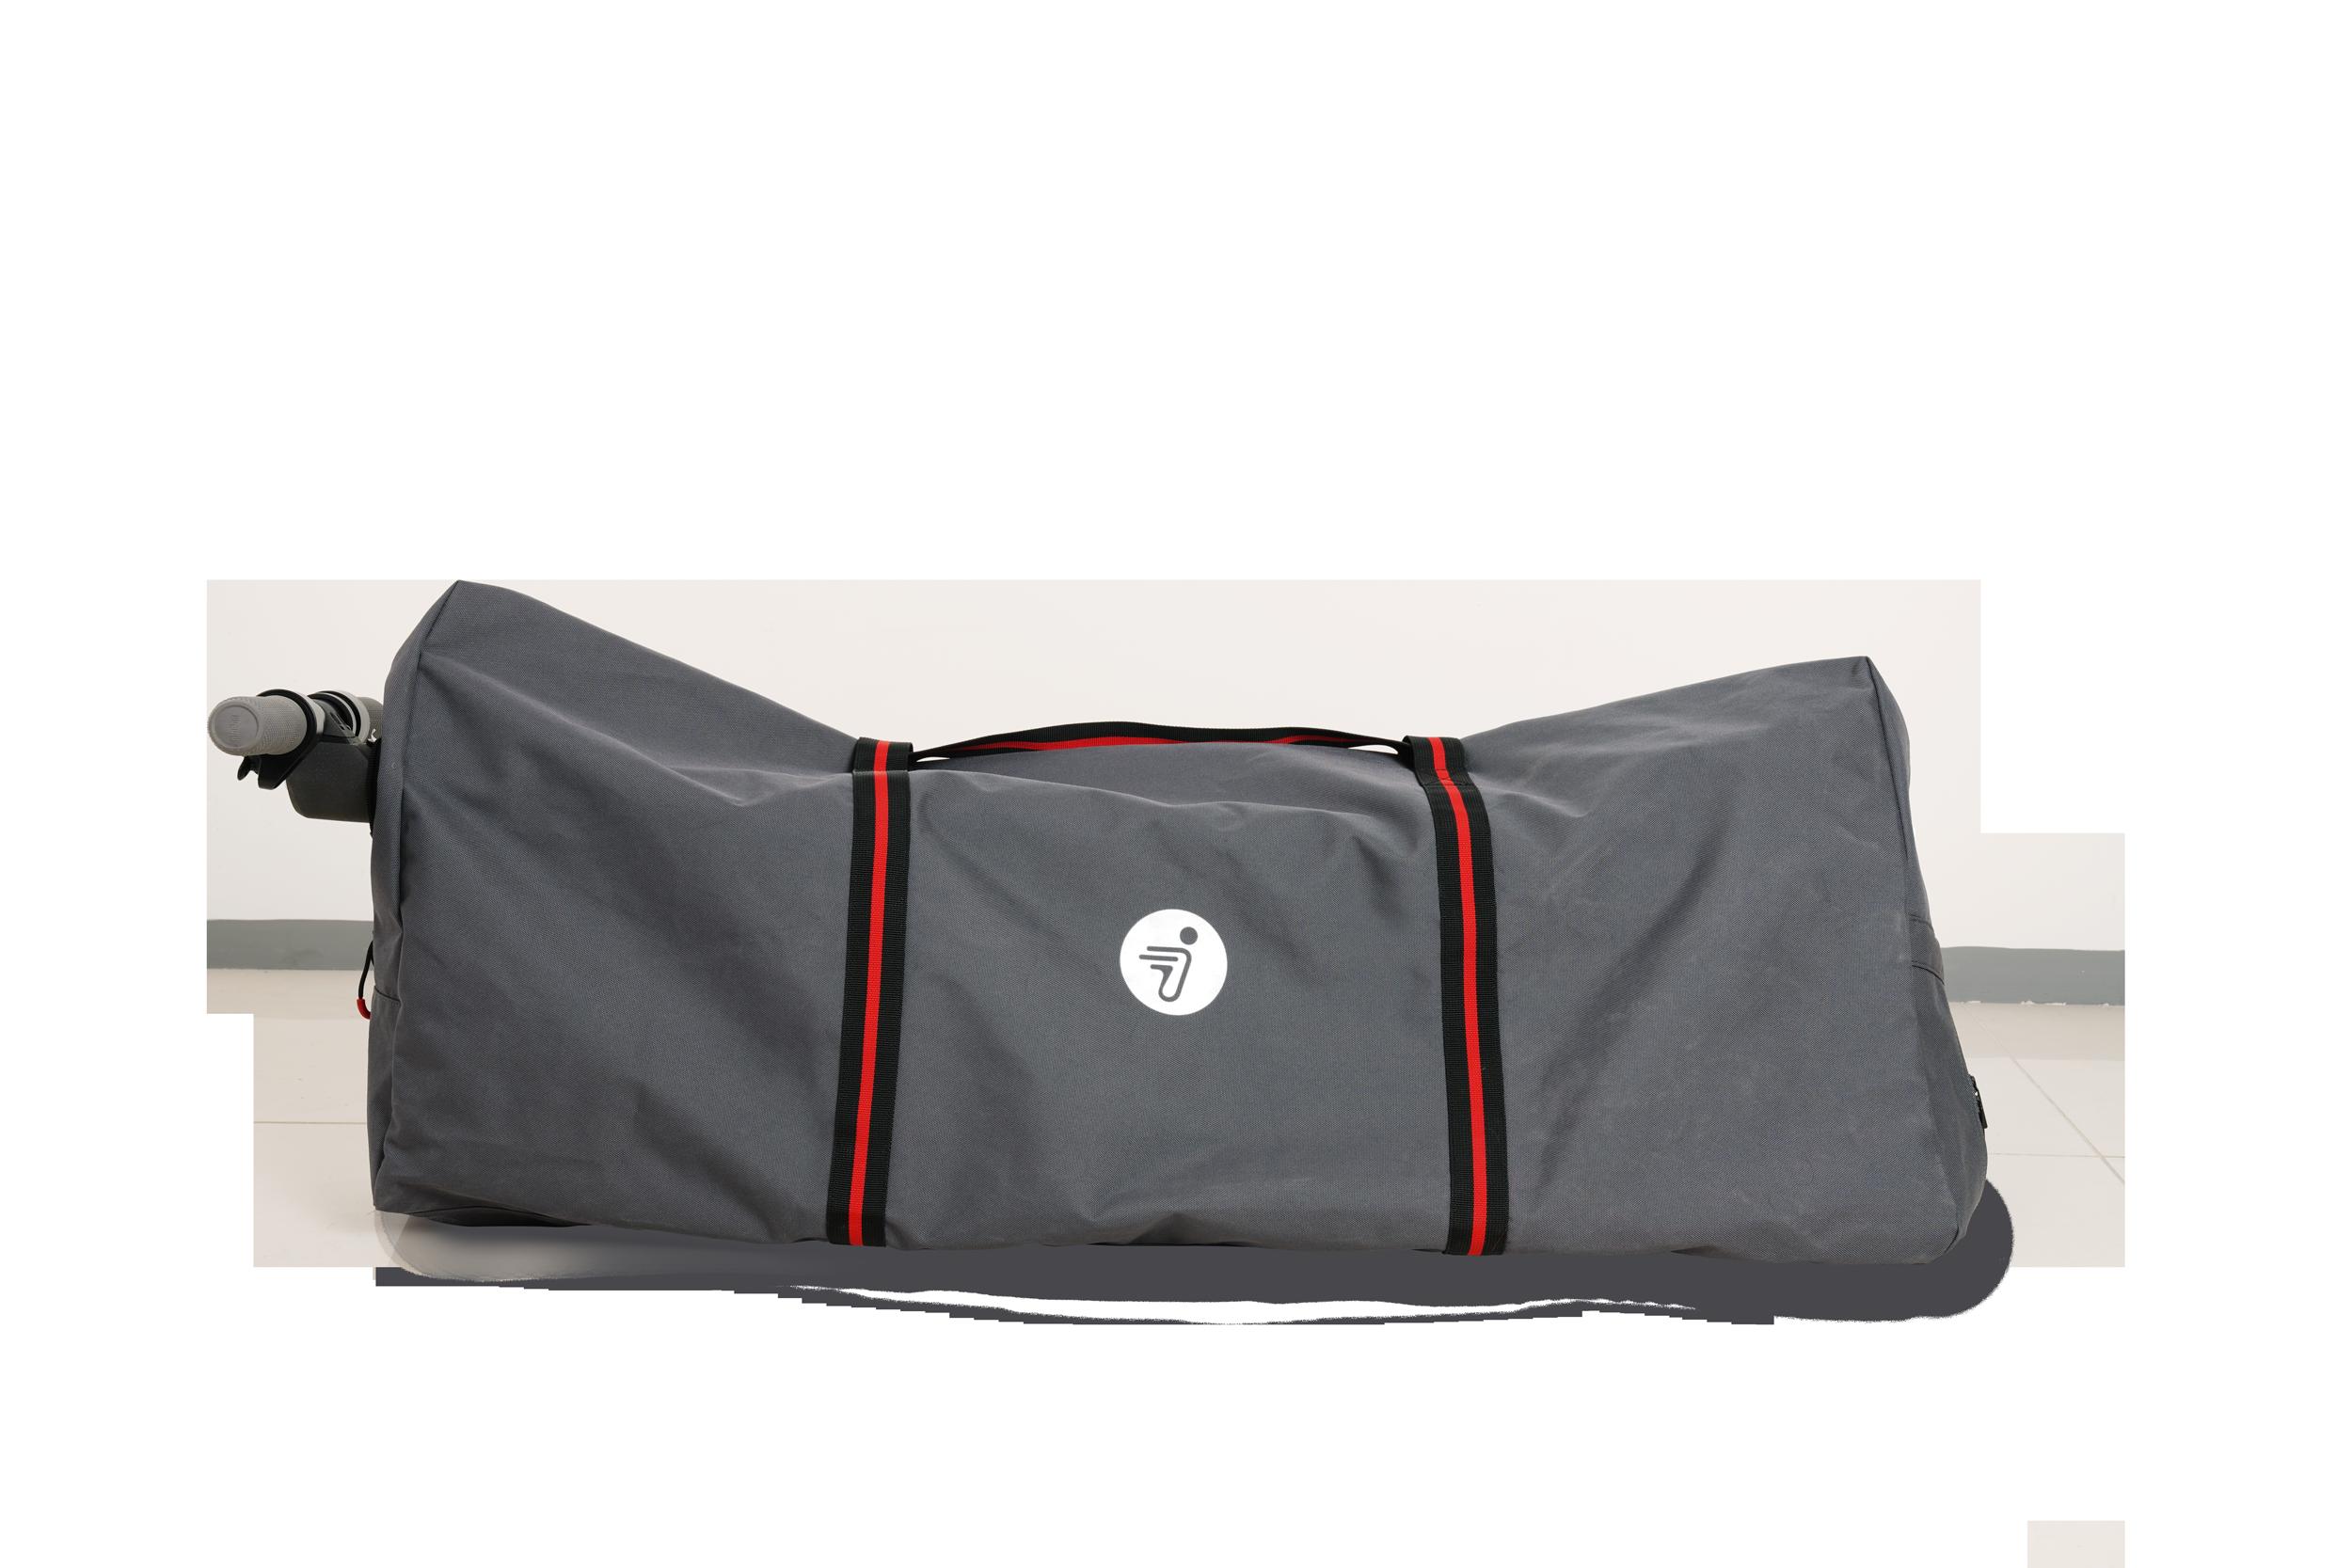 Segway Kickscooter Storage Bag Panmi